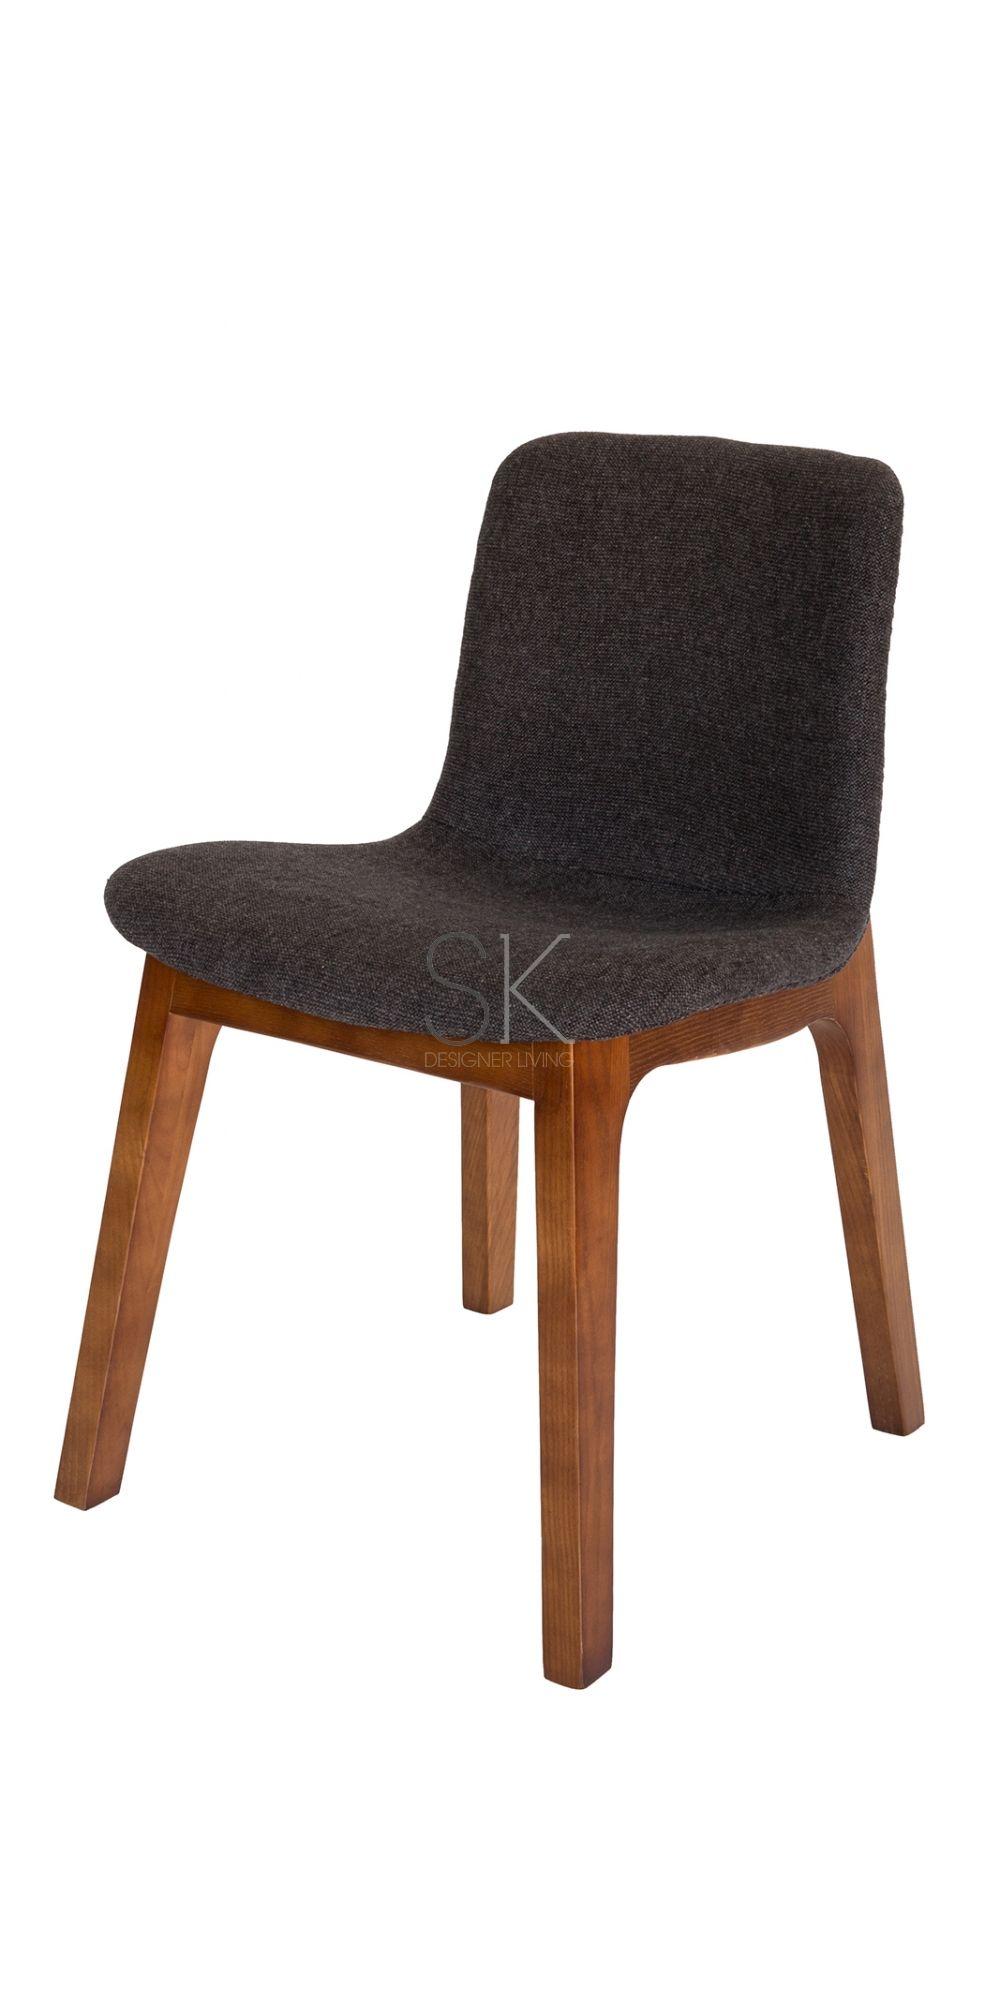 Fabulous Sk Designer Living Quoted 150Ea Replica Jasper Morrison Andrewgaddart Wooden Chair Designs For Living Room Andrewgaddartcom